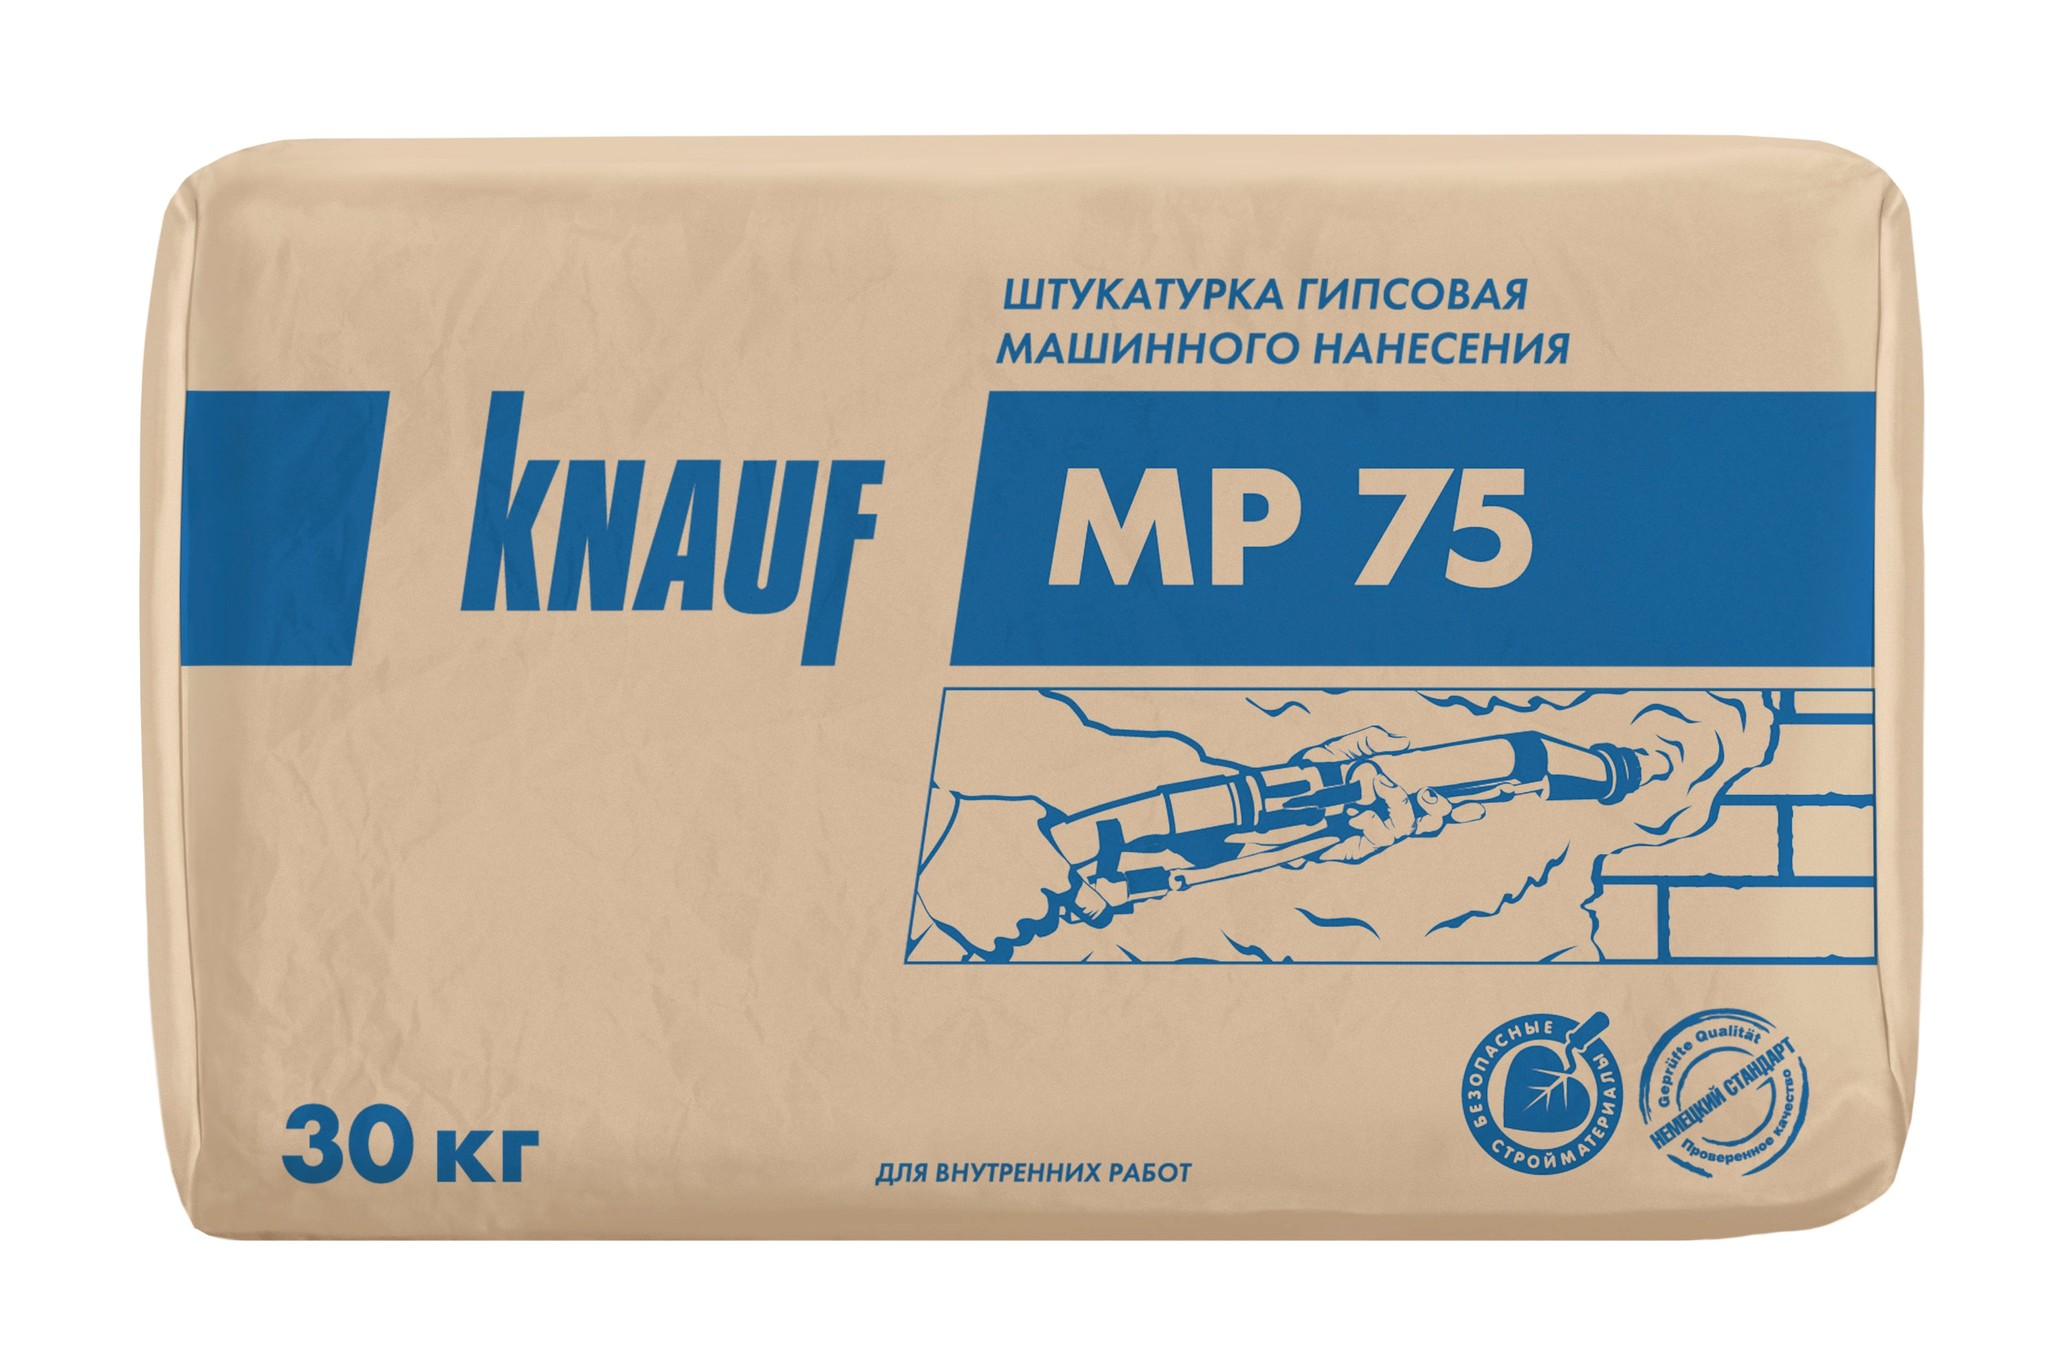 Штукатурки Гипсовая штукатурка Knauf МП 75, 30 кг 159a392dcee74cc198392587dcfcbeb5.jpg